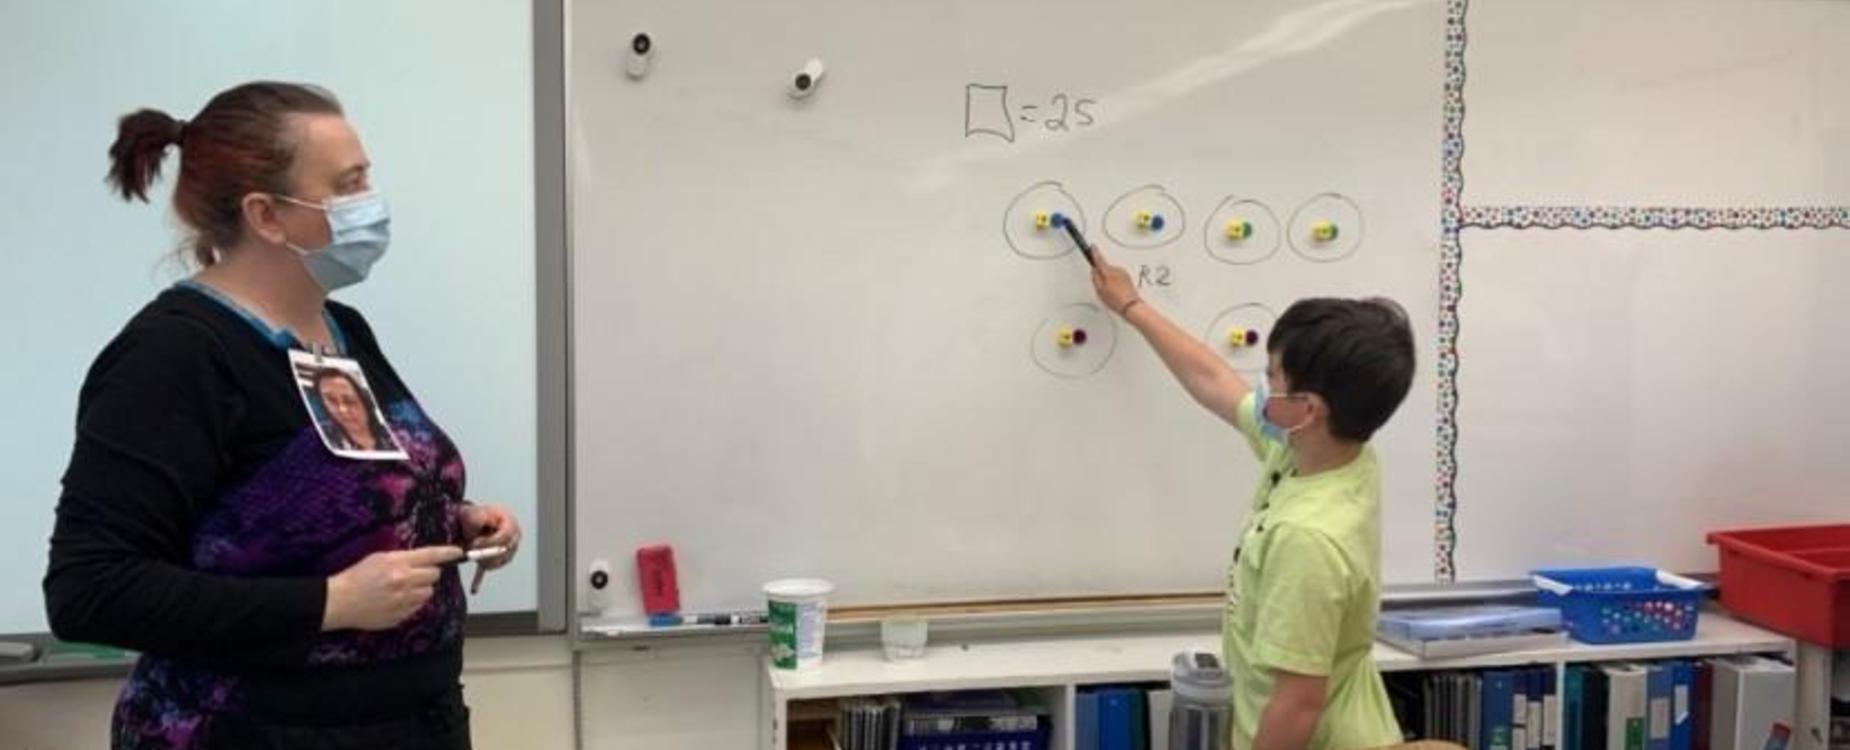 Teacher watching a student working through a math problem on the whiteboard.